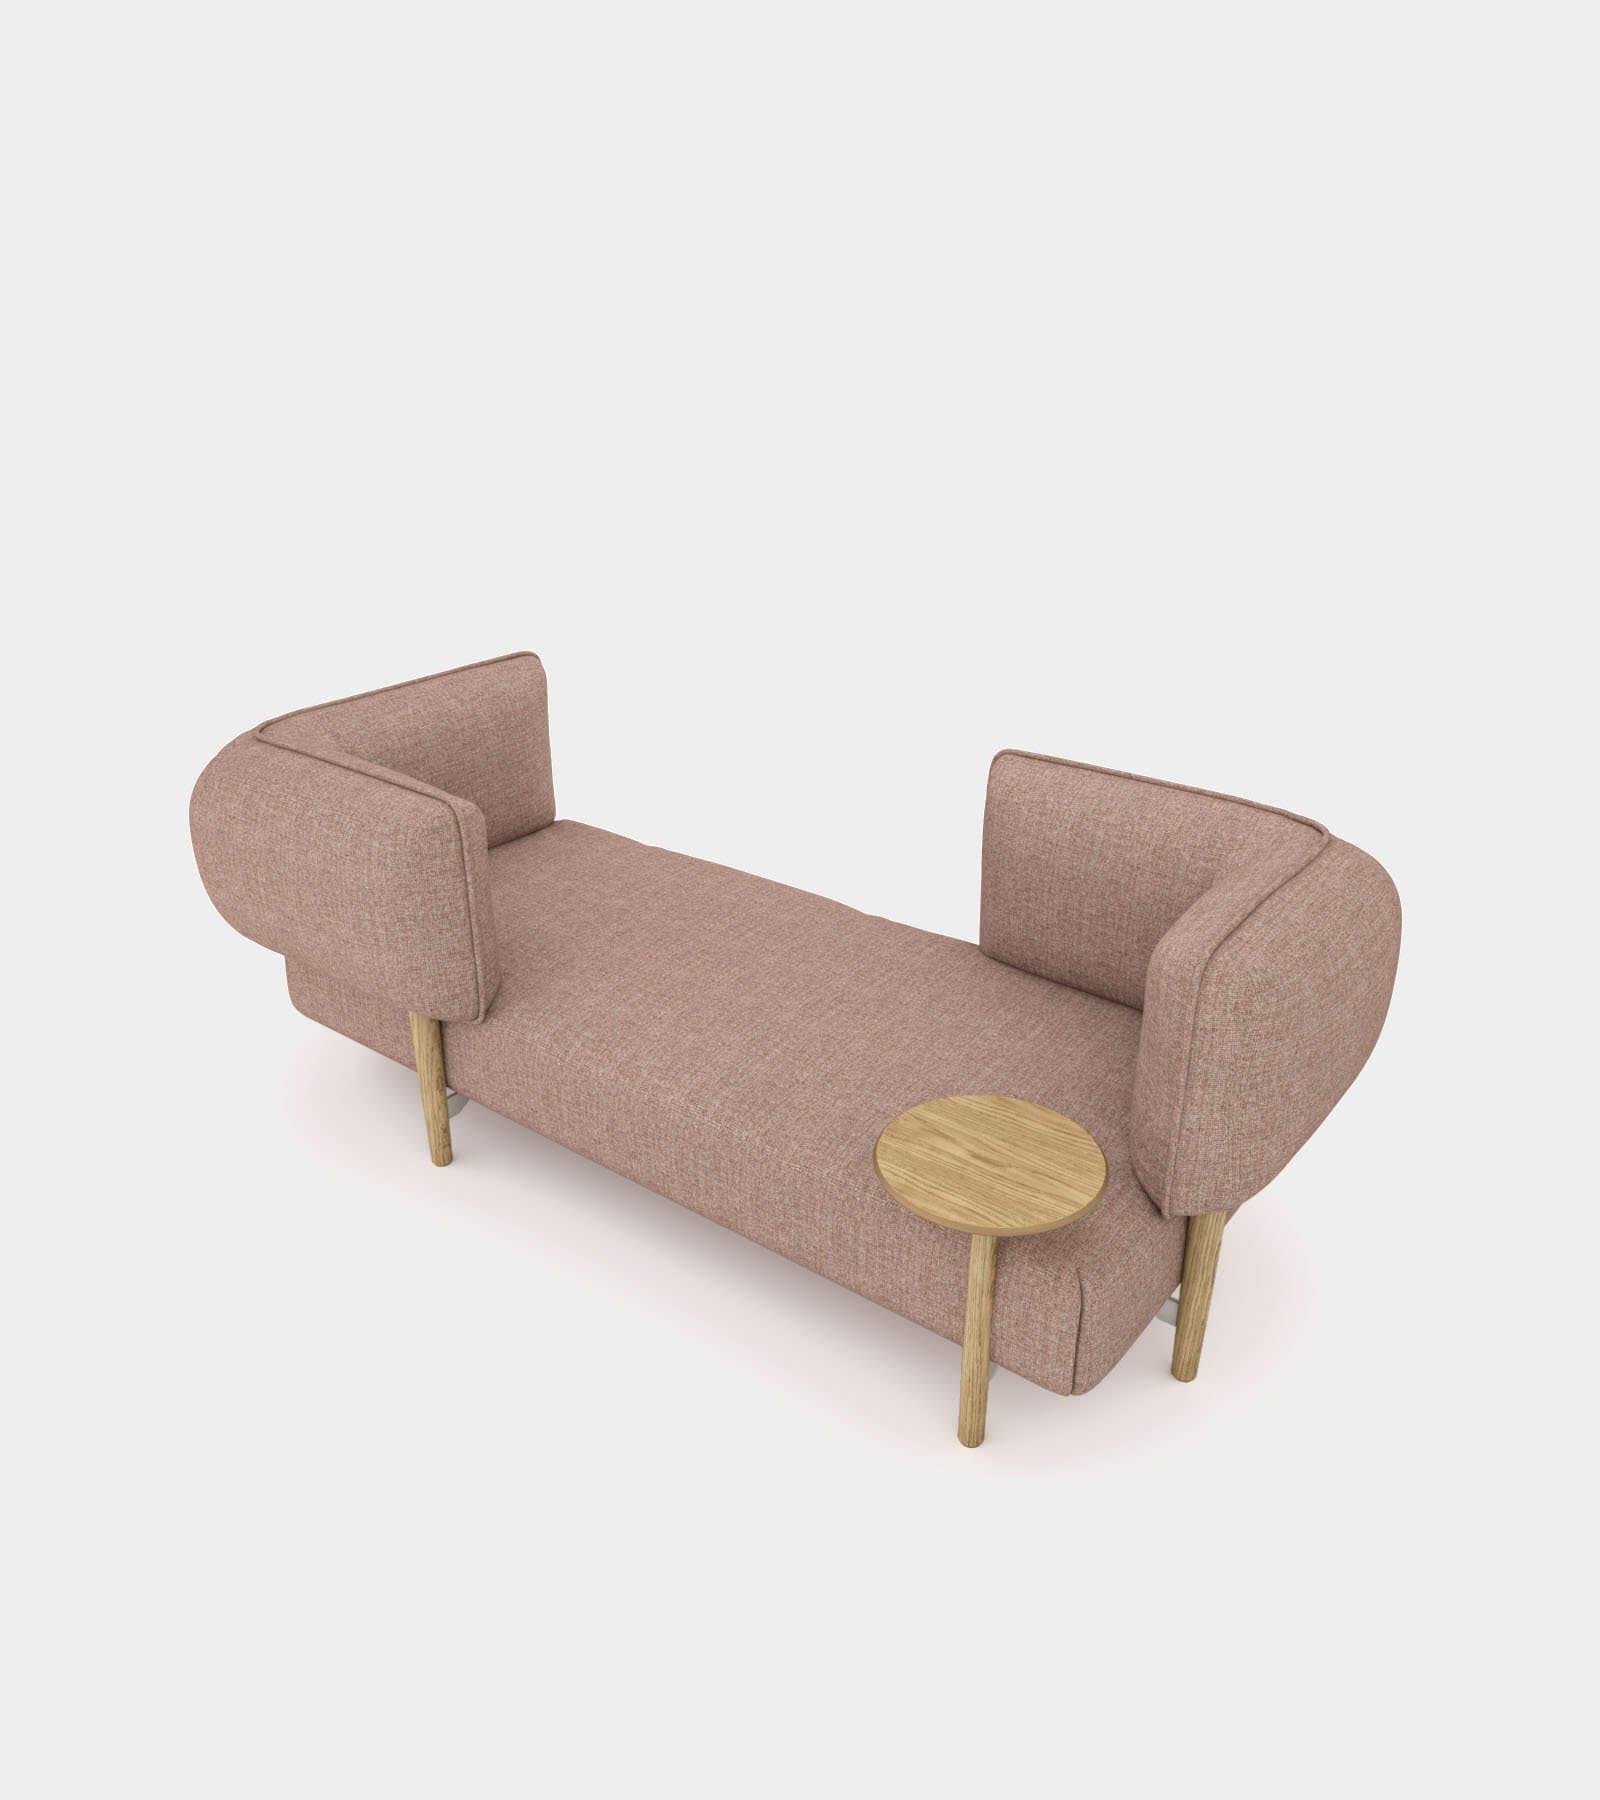 Modular fabric seat bench 2- 3D Model